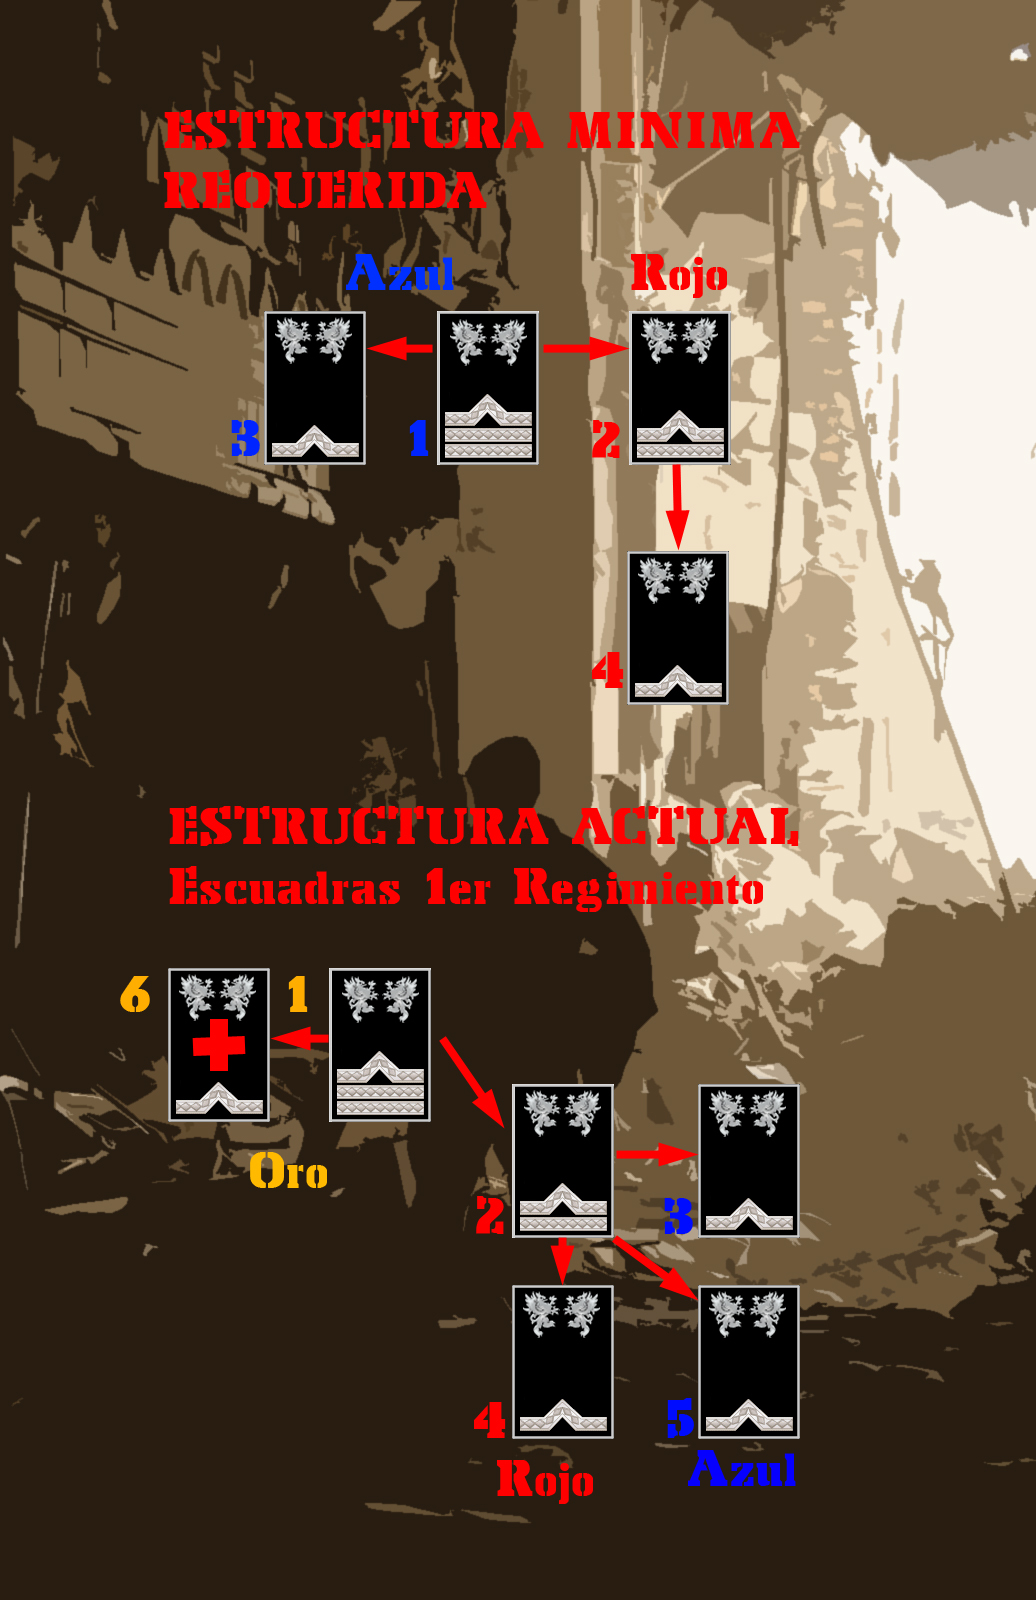 La Escuadra Regular de Infantería | Wiki Achs | FANDOM powered by Wikia